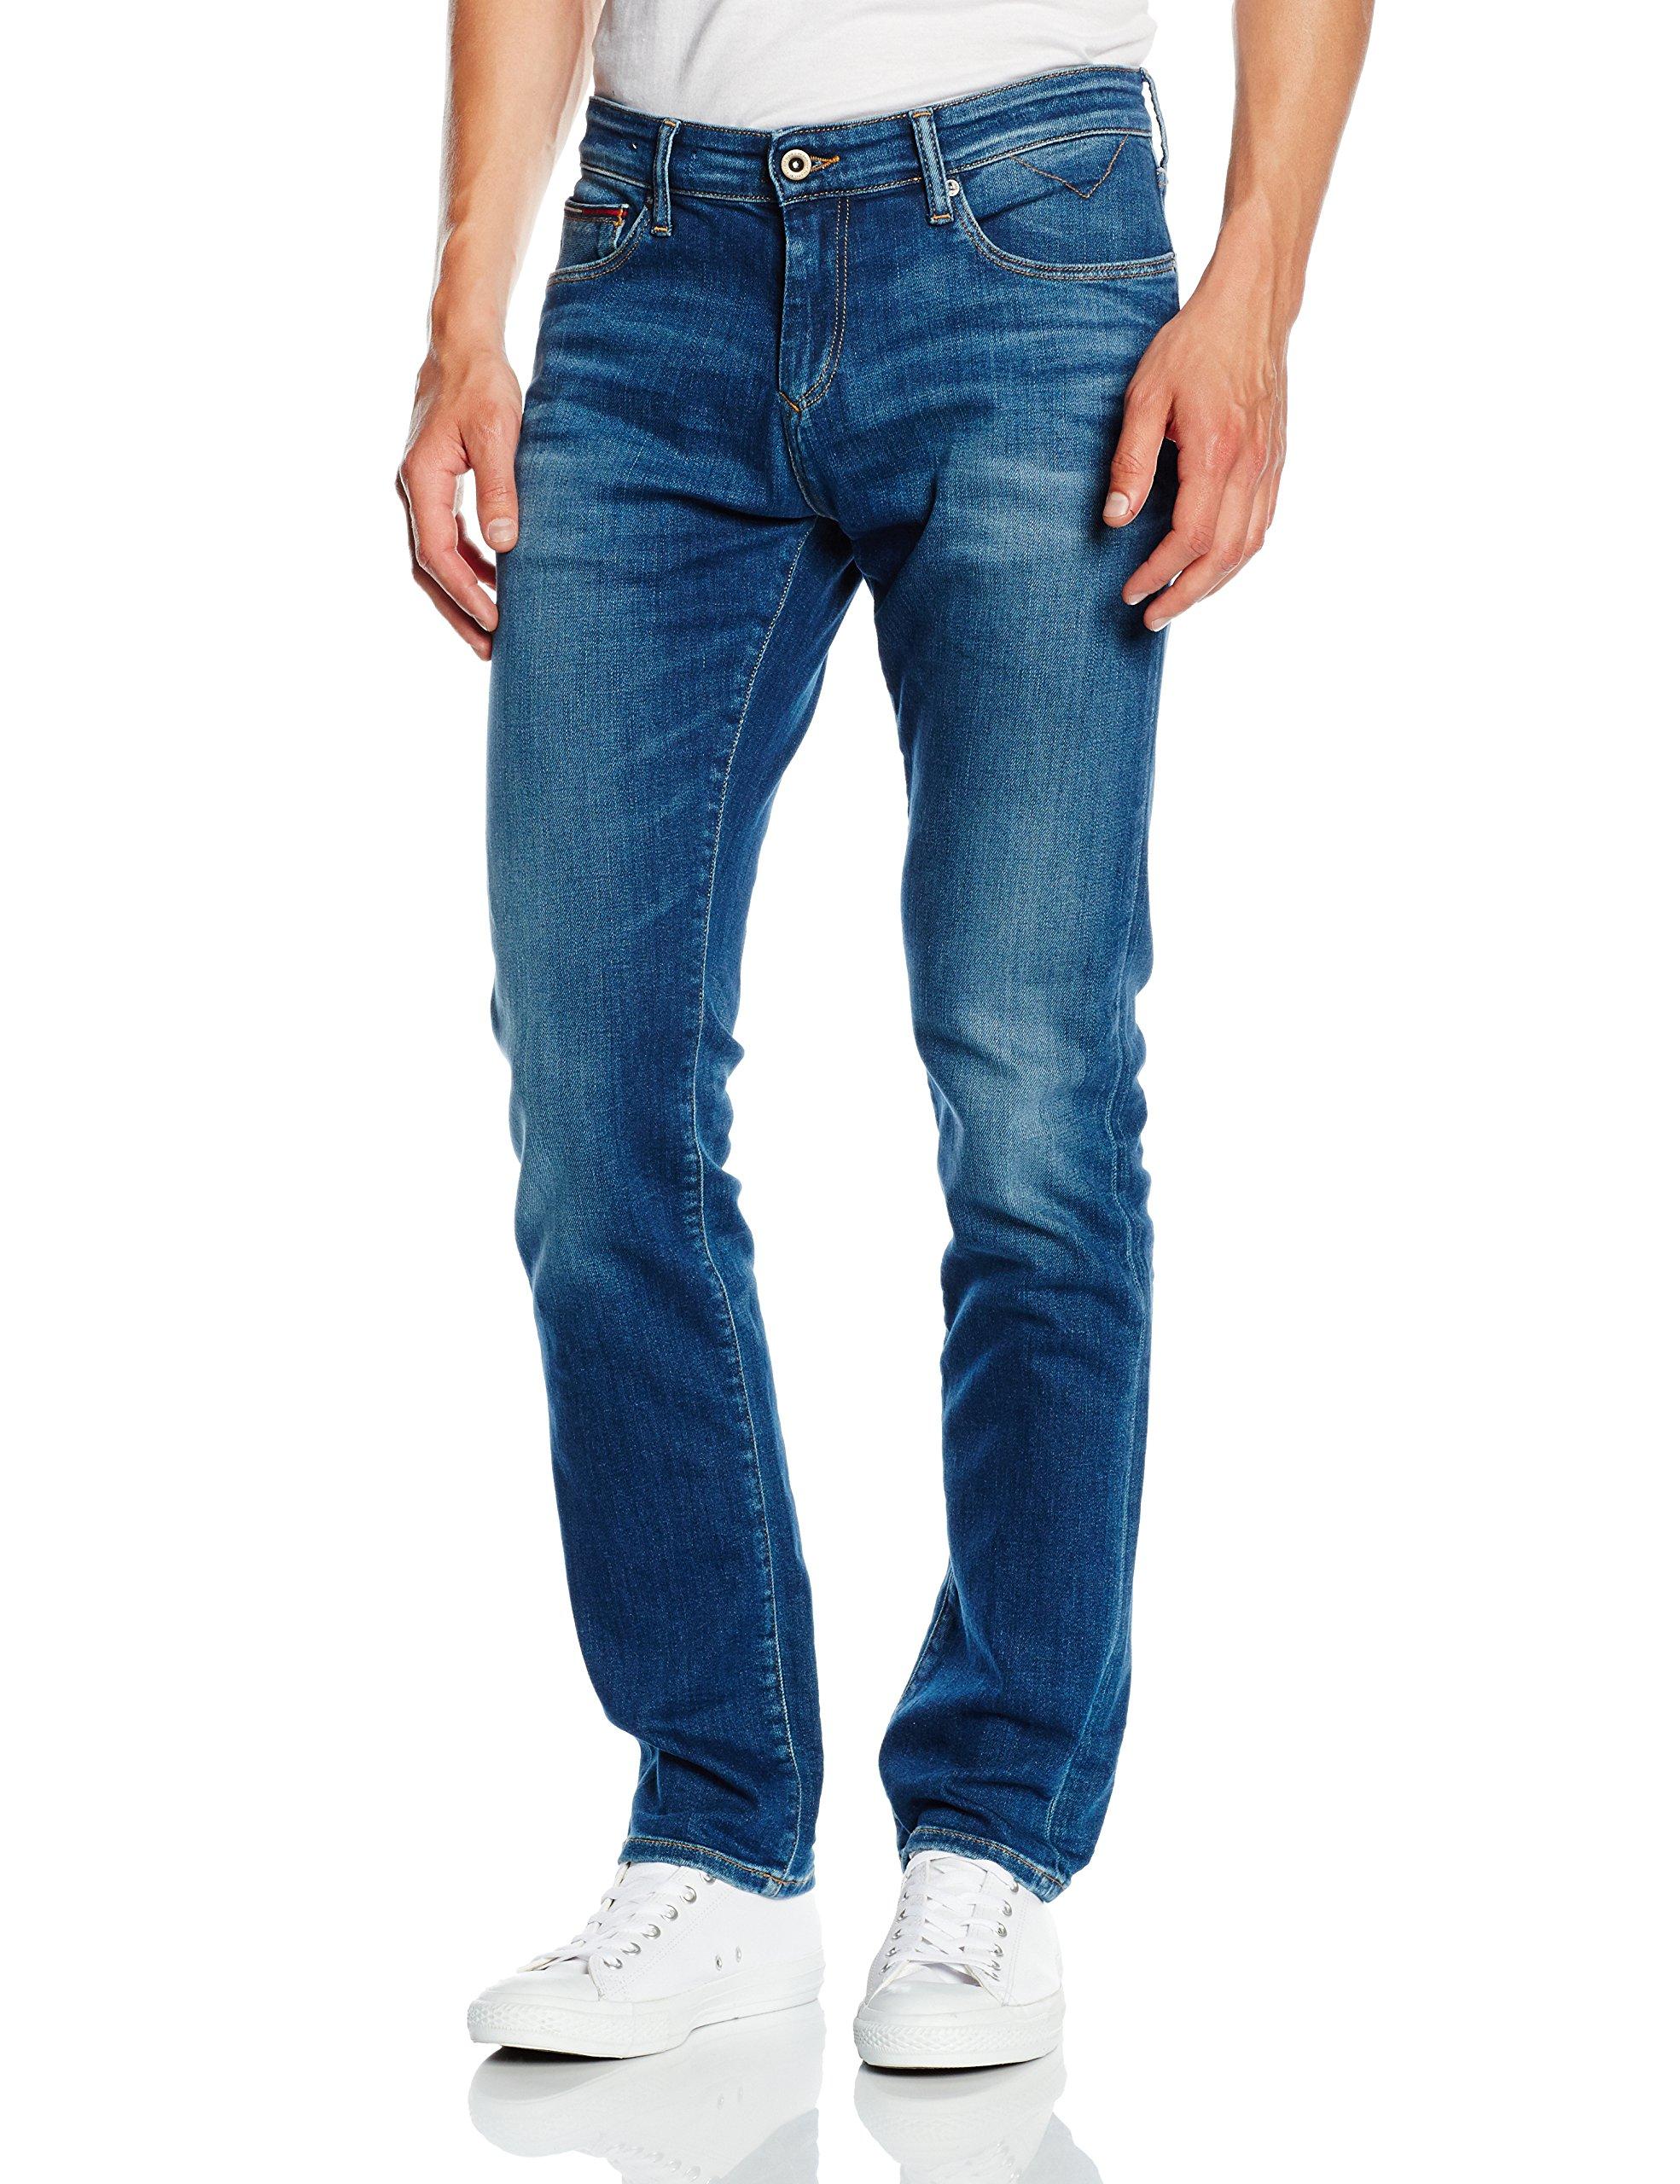 Tommy l34 Hilfiger DenimJean W30 Jeans Bleu Homme rshxoQBtdC